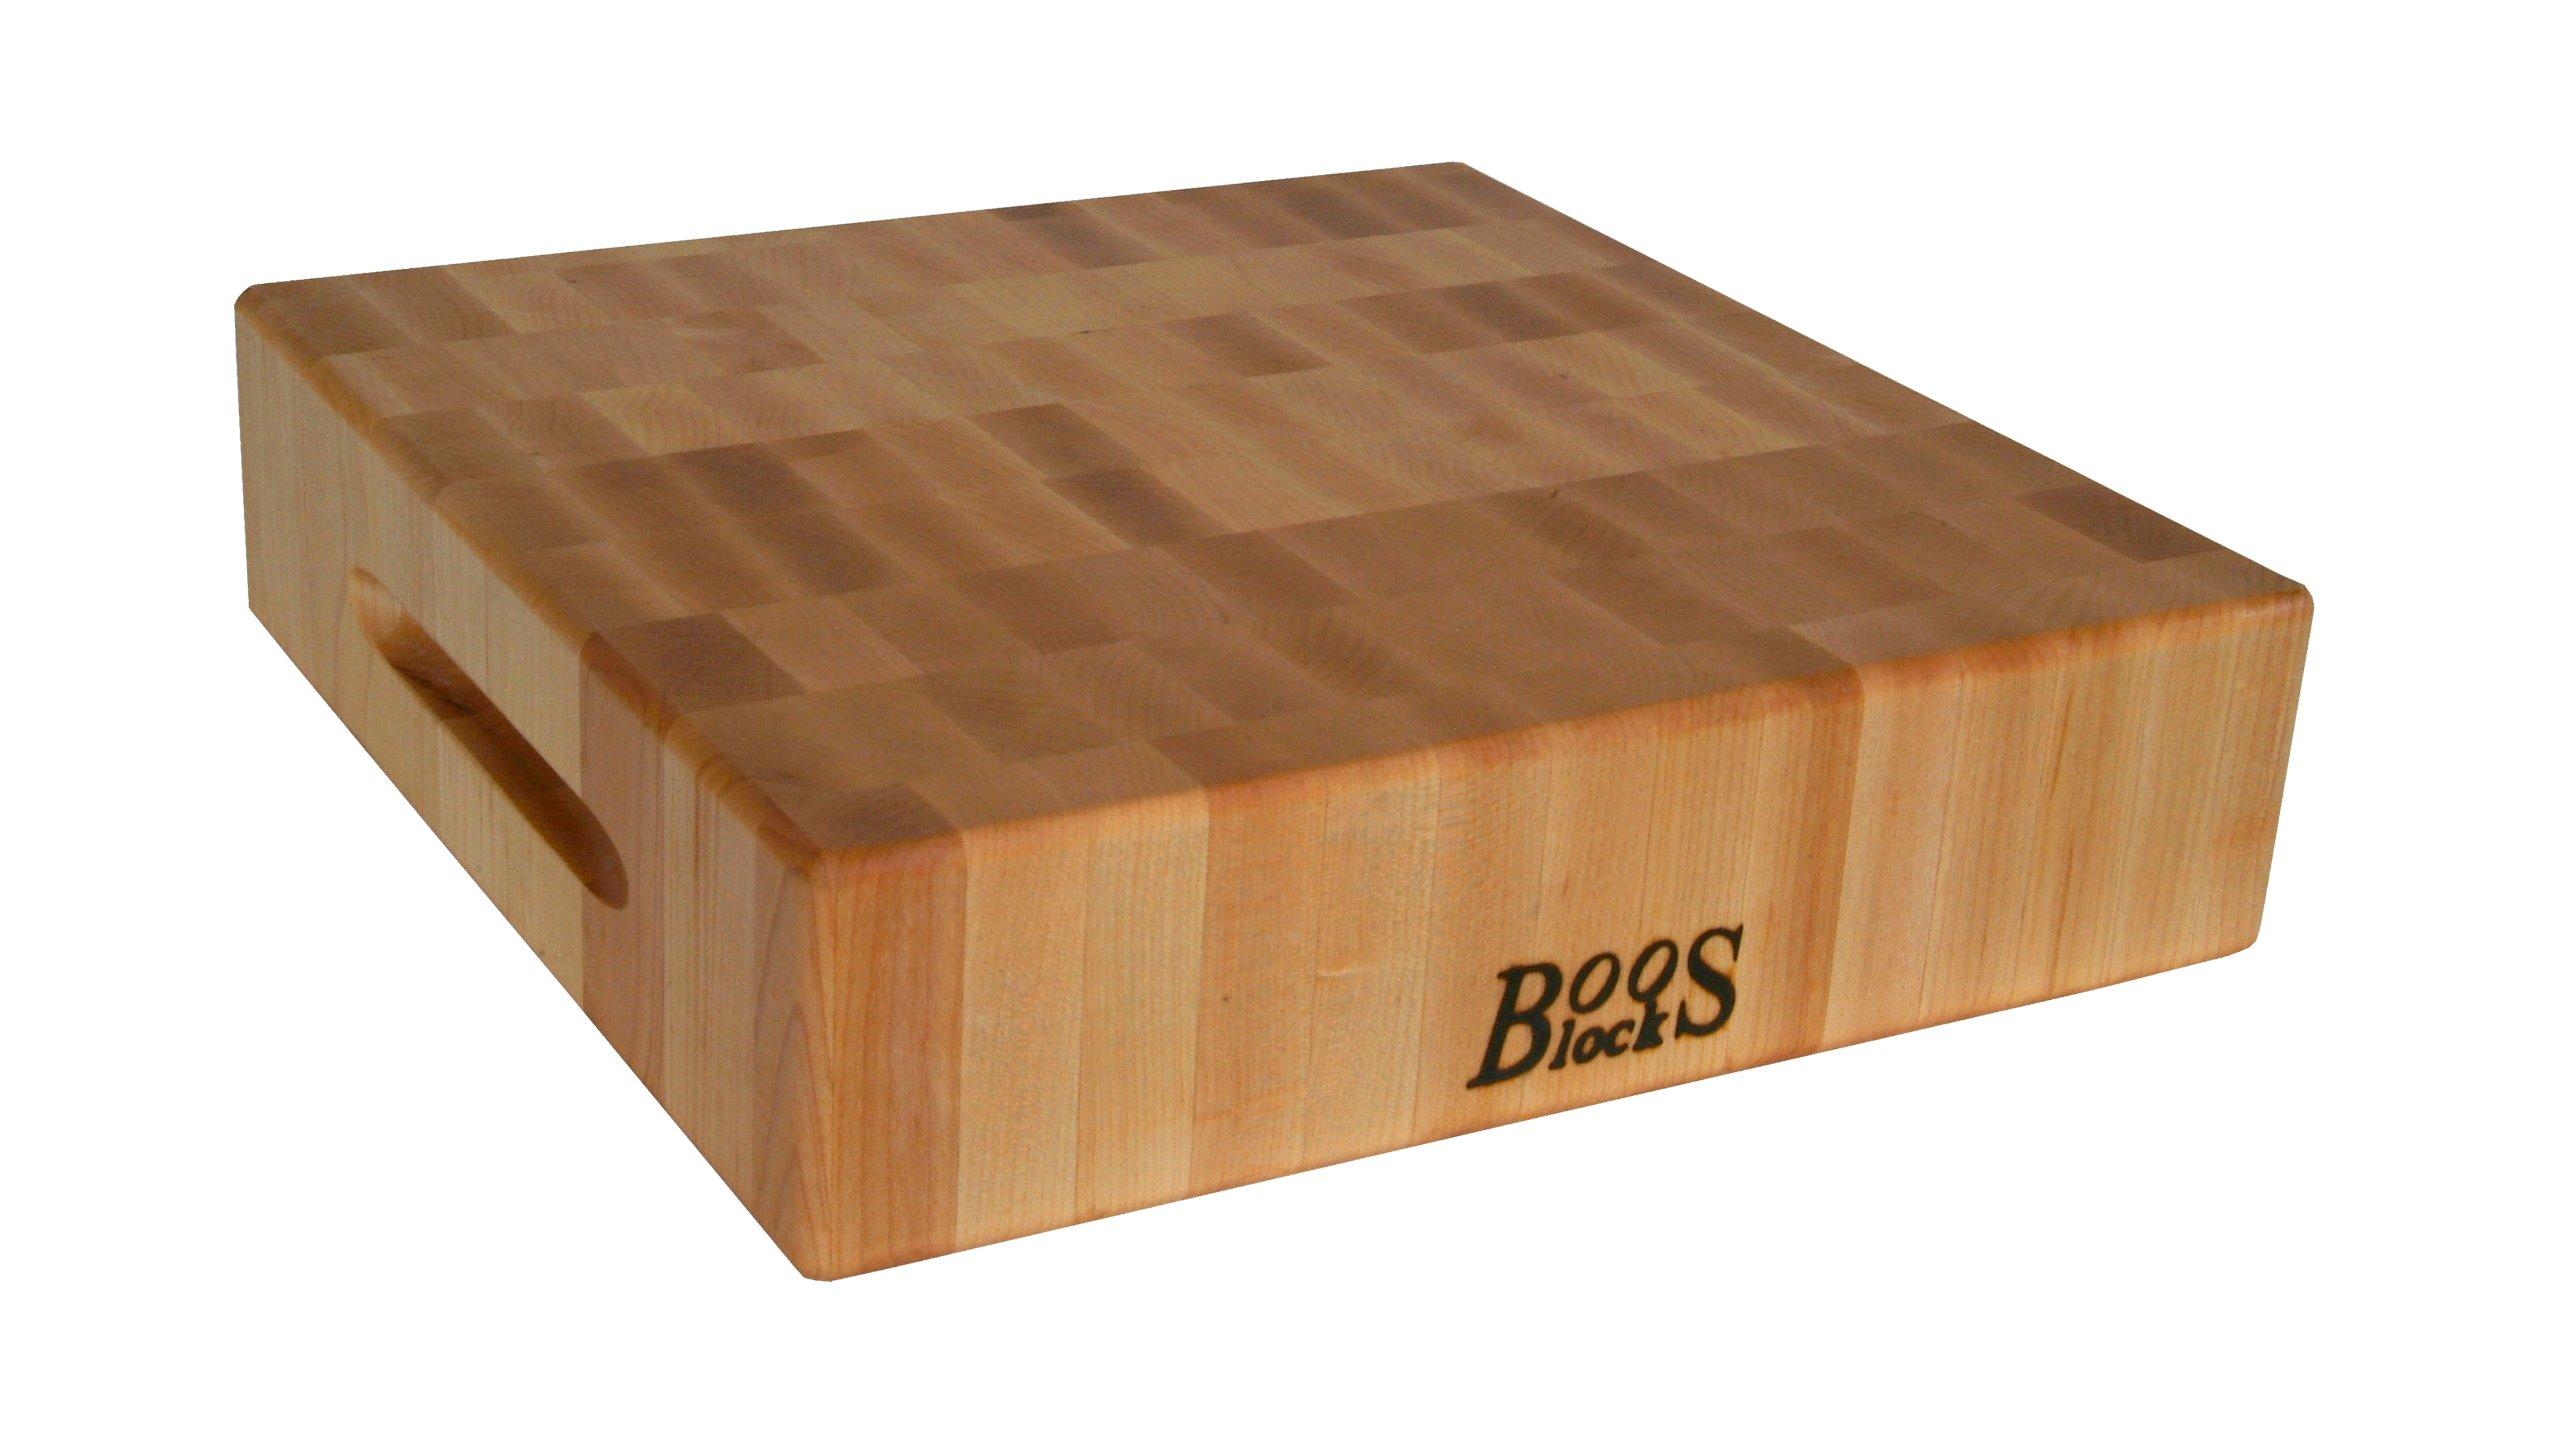 John Boos Maple Wood End Grain Reversible Butcher Block Cutting Board, 15'' x 15'' x 3 Inches